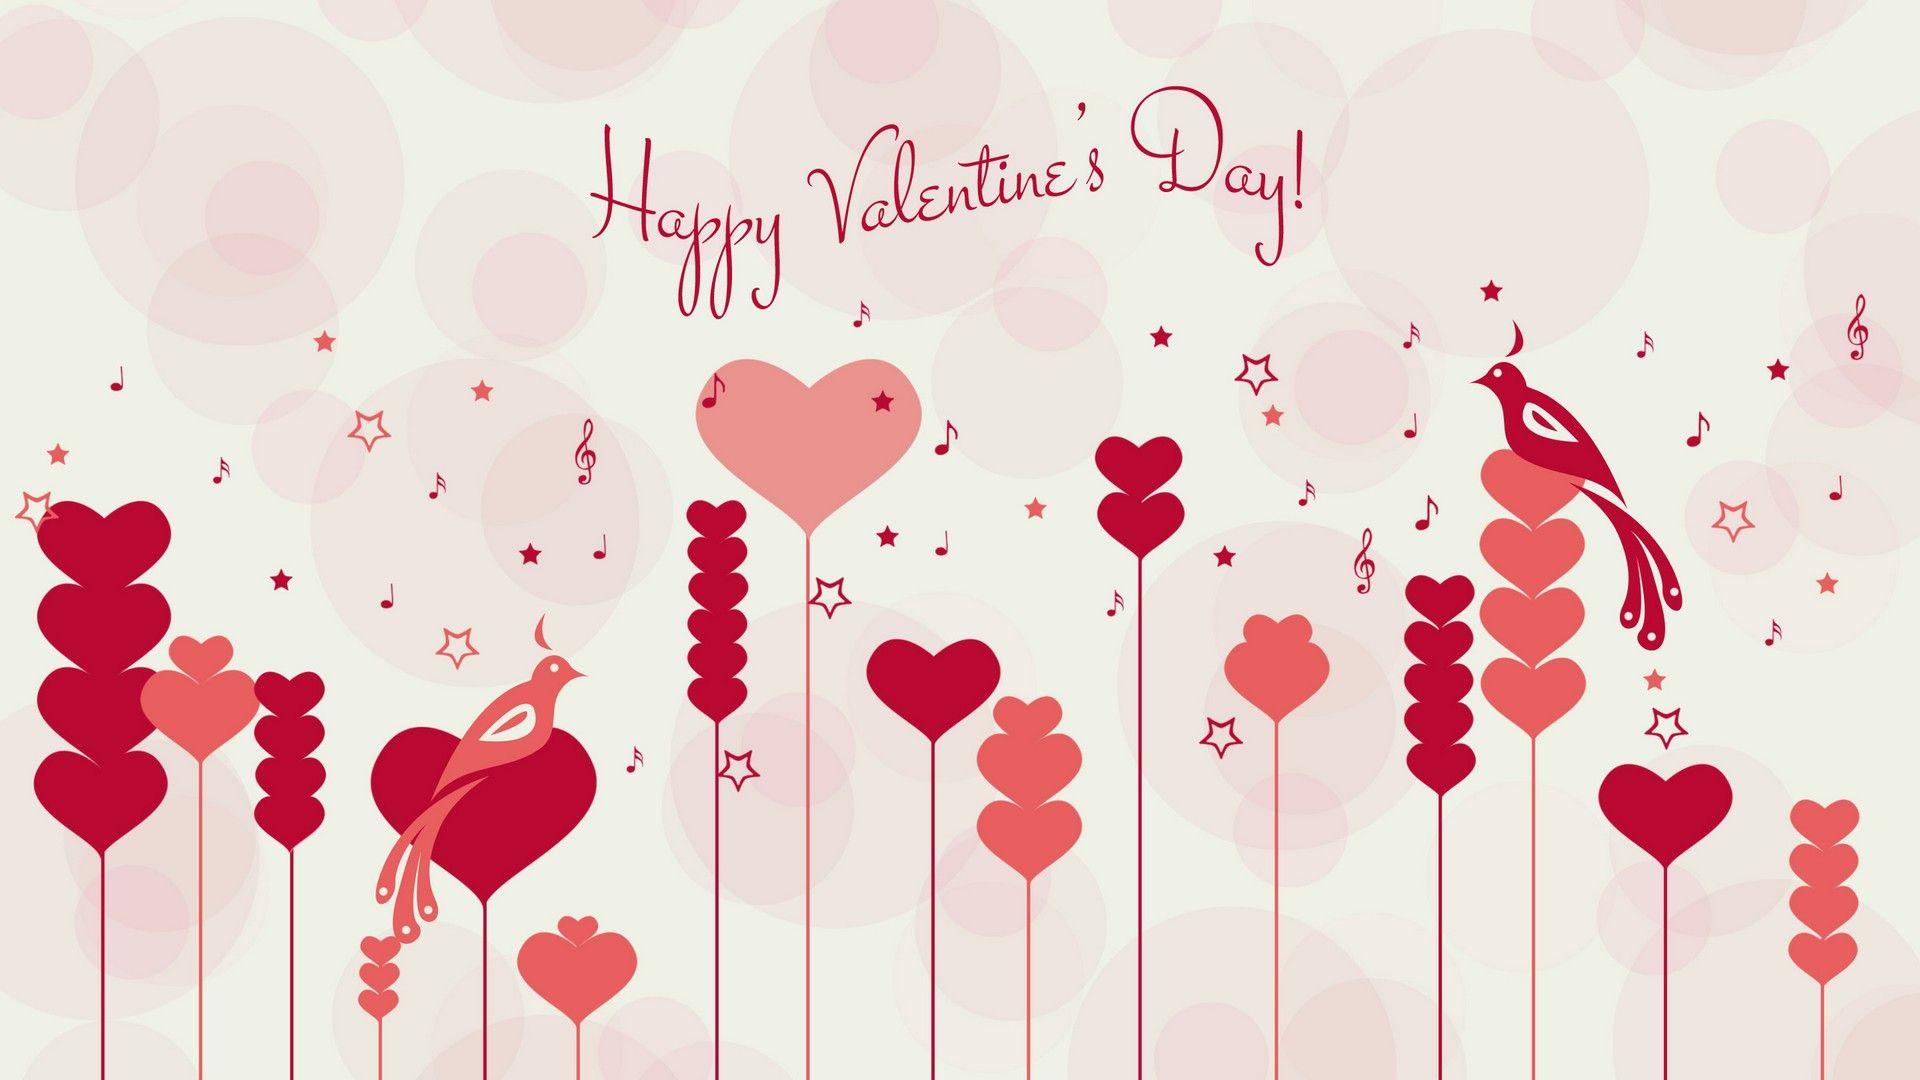 Happy Valentine Day Wallpaper Hd 2021 Live Wallpaper Hd Valentines Wallpaper Happy Valentines Day Images Valentines Day Images Free